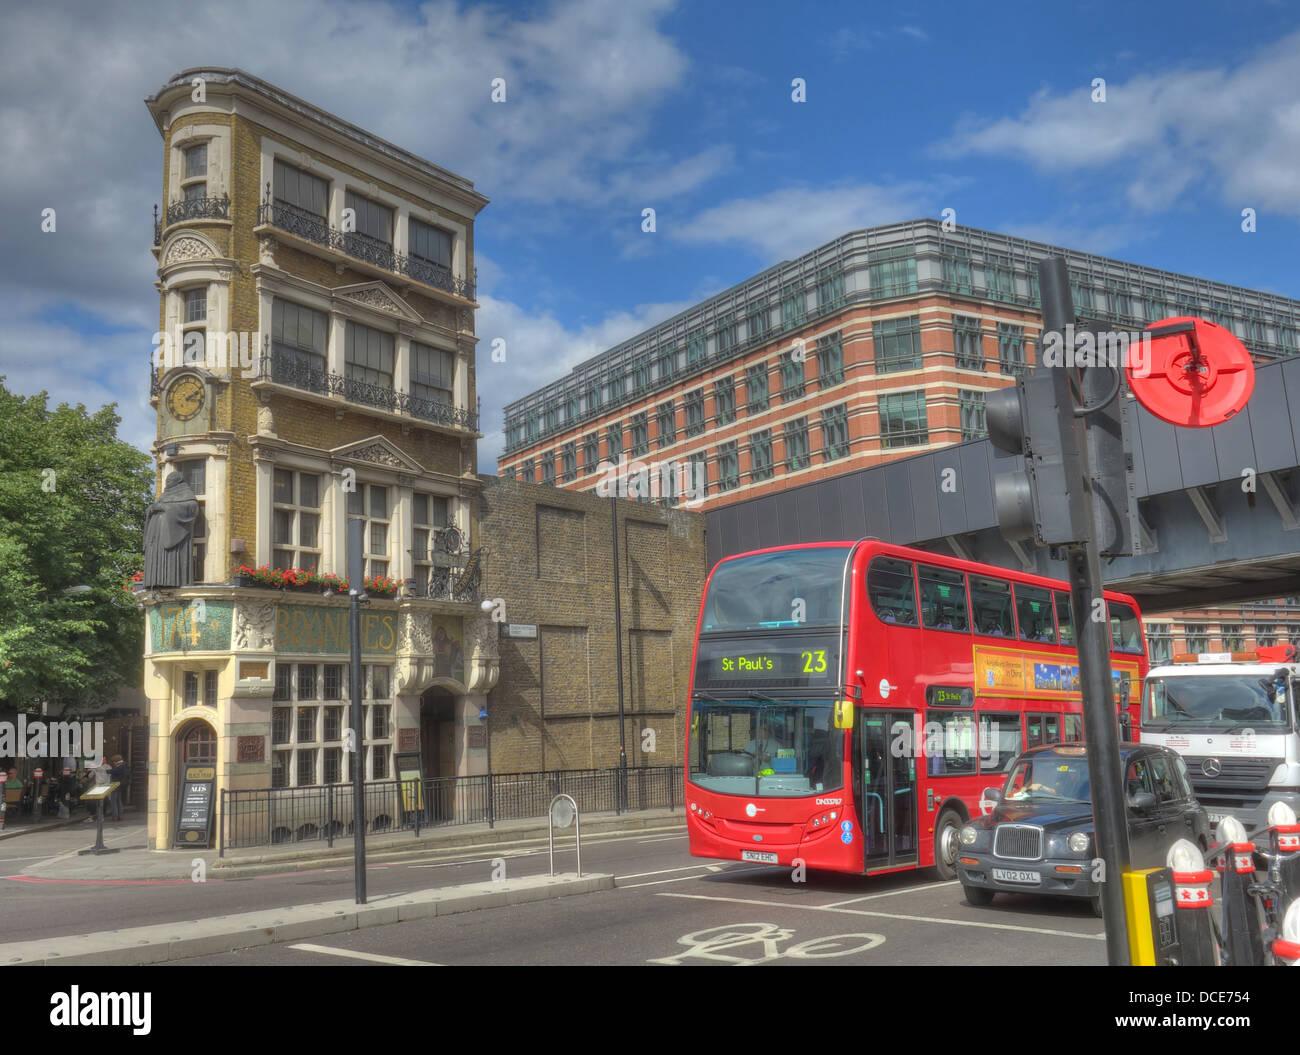 Laden Sie dieses Alamy Stockfoto Black Friar Pub, Kreuzung Königin Victoria St, Blackfriars, London, England UK EC4V 4E - DCE754